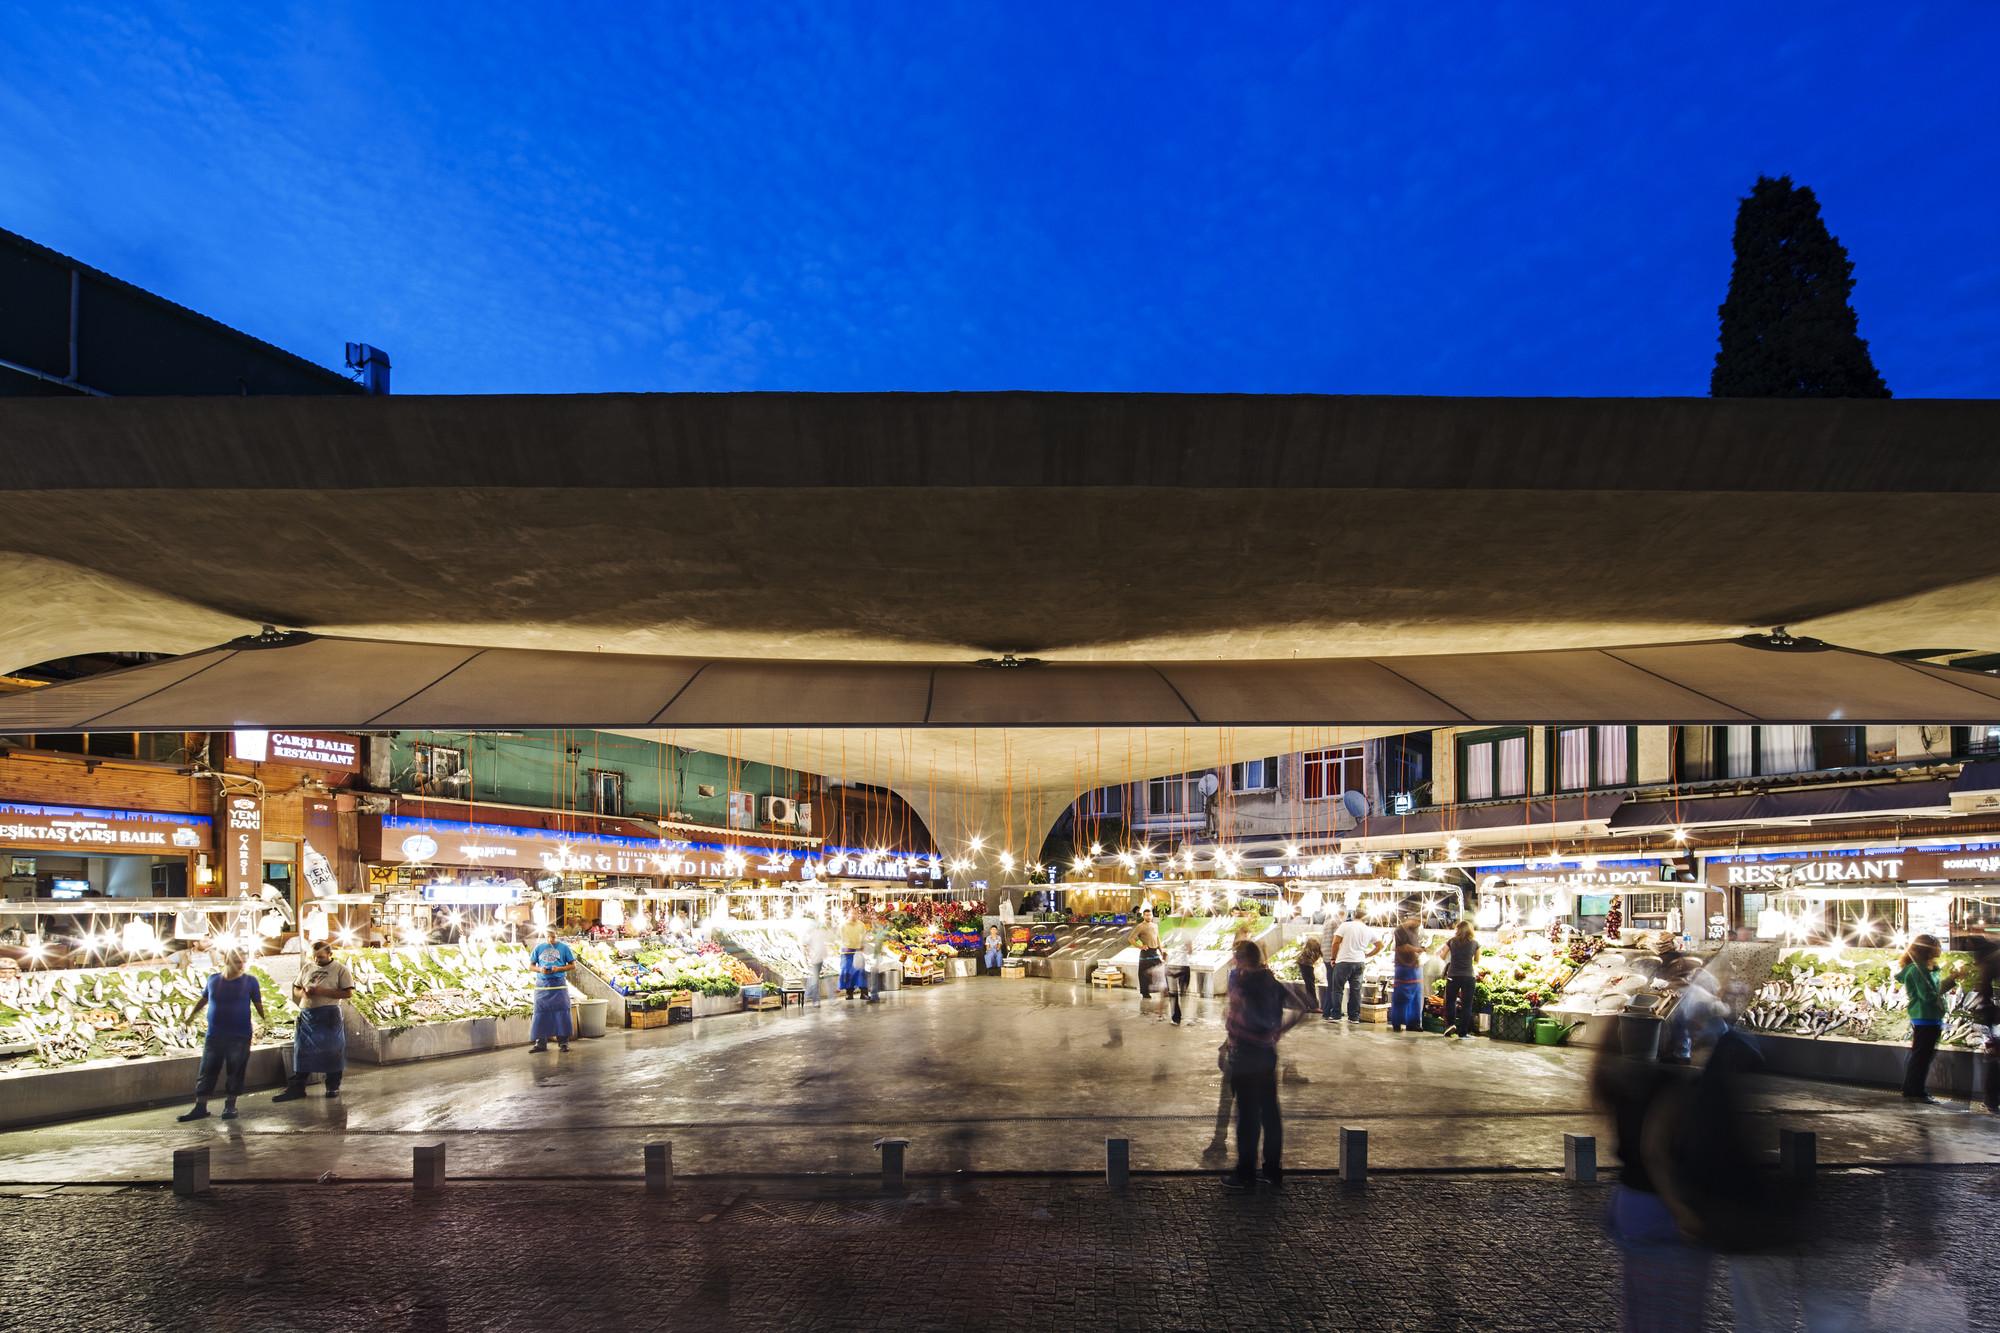 Gallery of besiktas fish market refurbishment gad 29 for Hagen s fish market